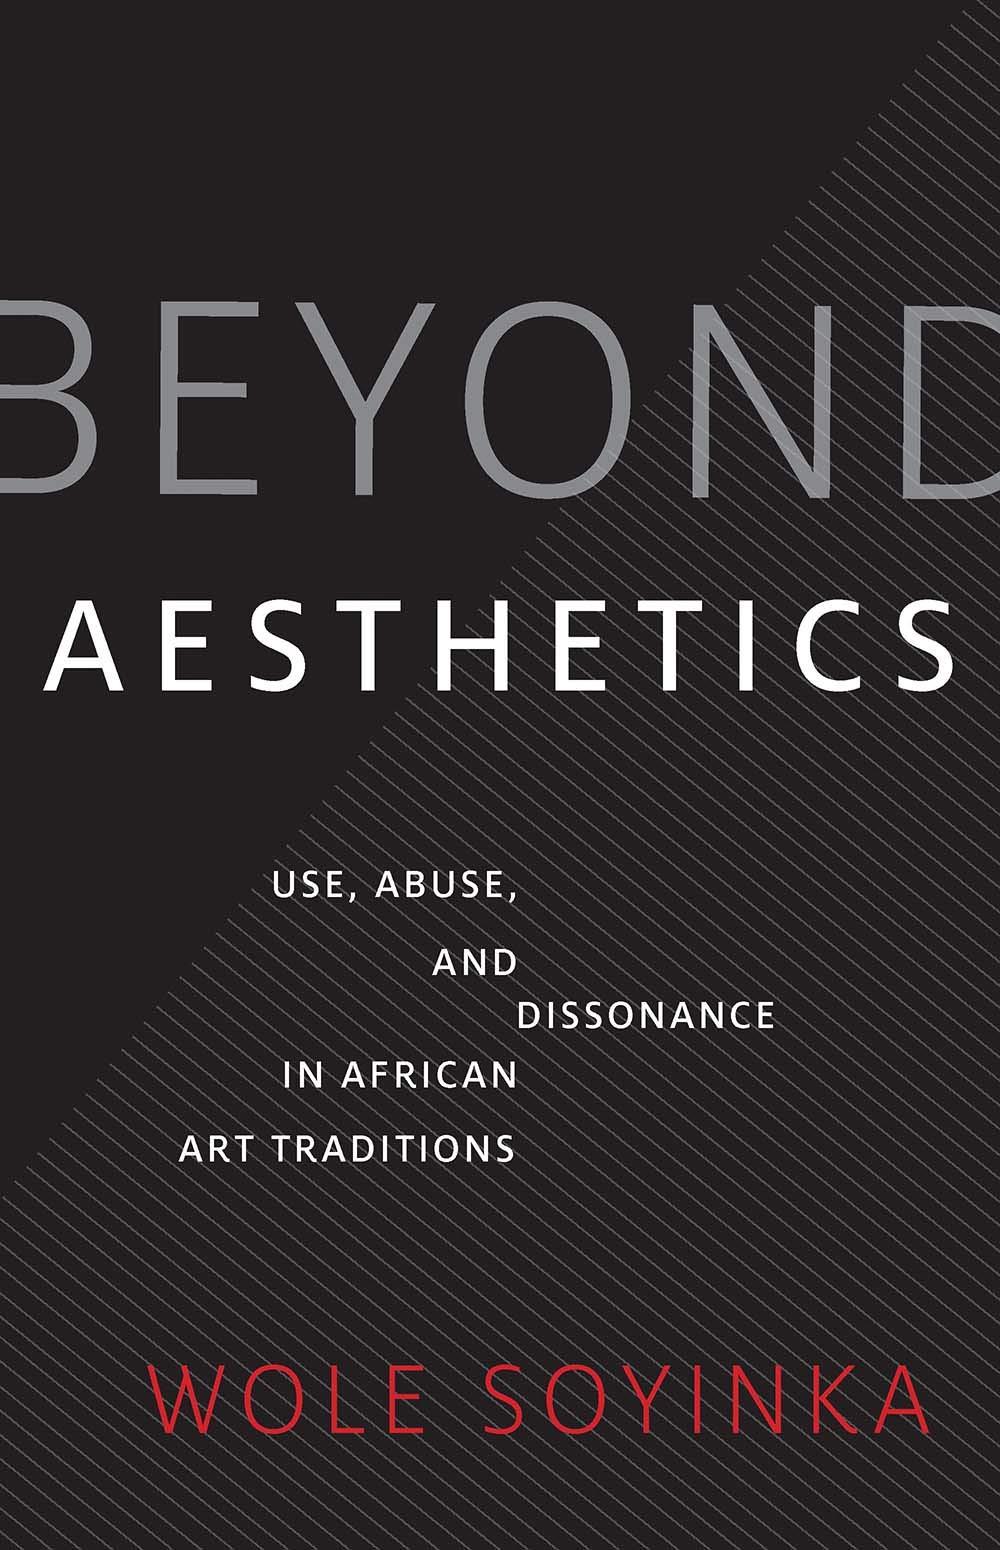 "Image result for beyond aesthetics wole soyinka"""